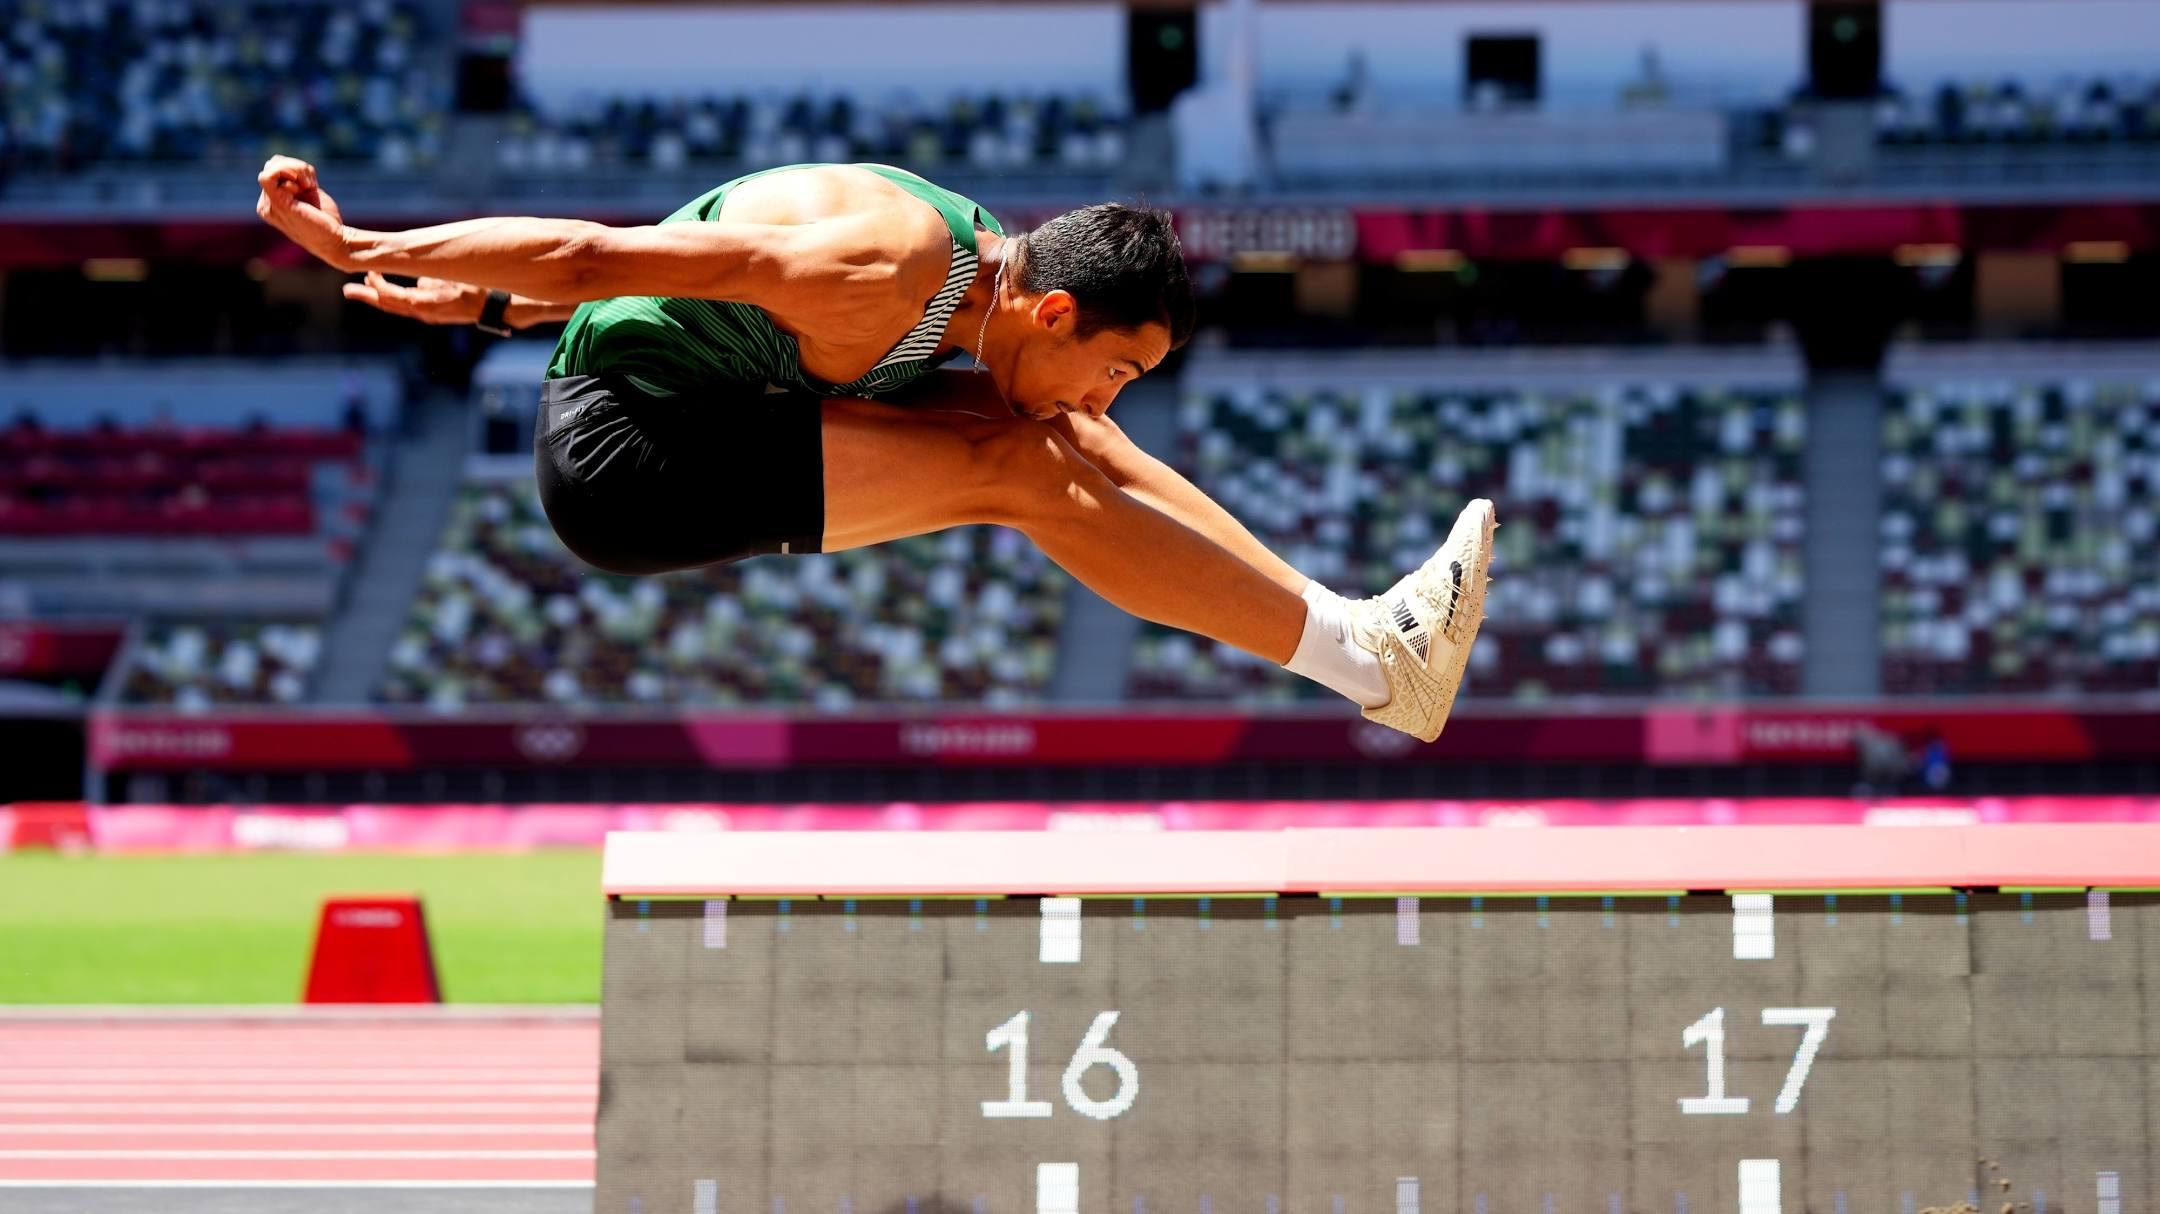 yasser triki triple saut profil tokyo 17m43